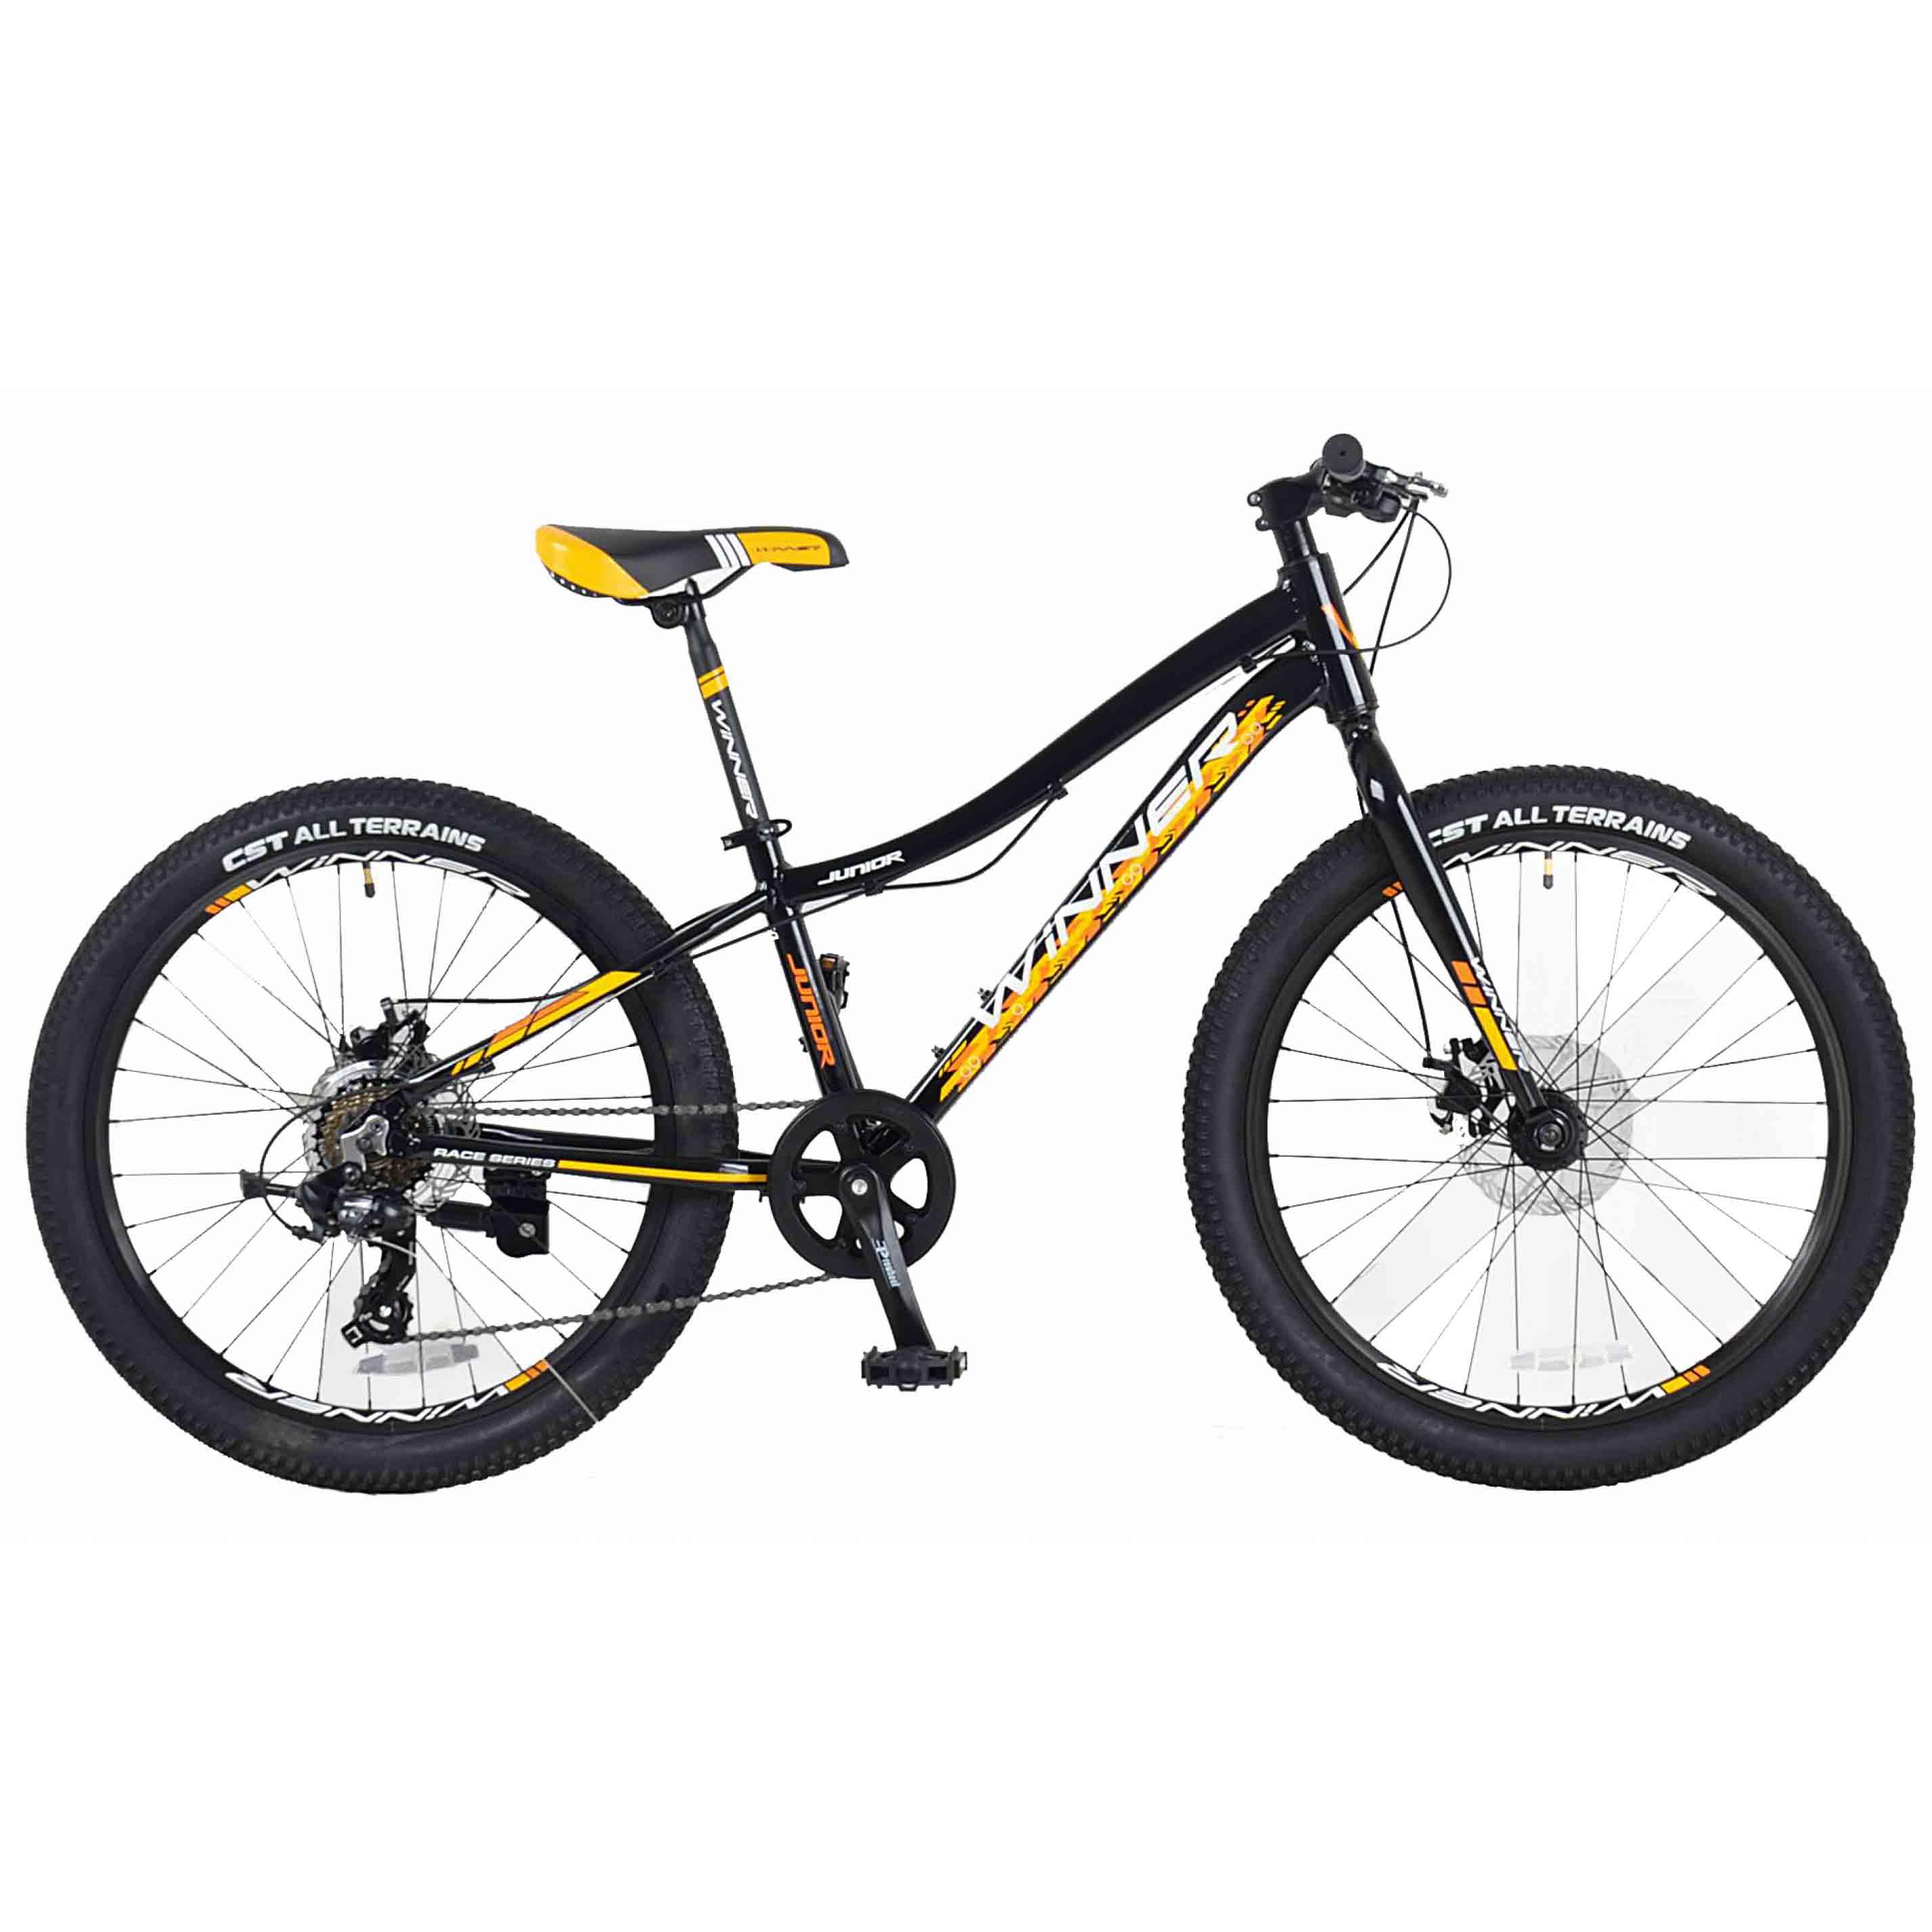 Фото Детский Велосипед Winner 24″ JUNIOR+ 12,5″ (черн-желт)